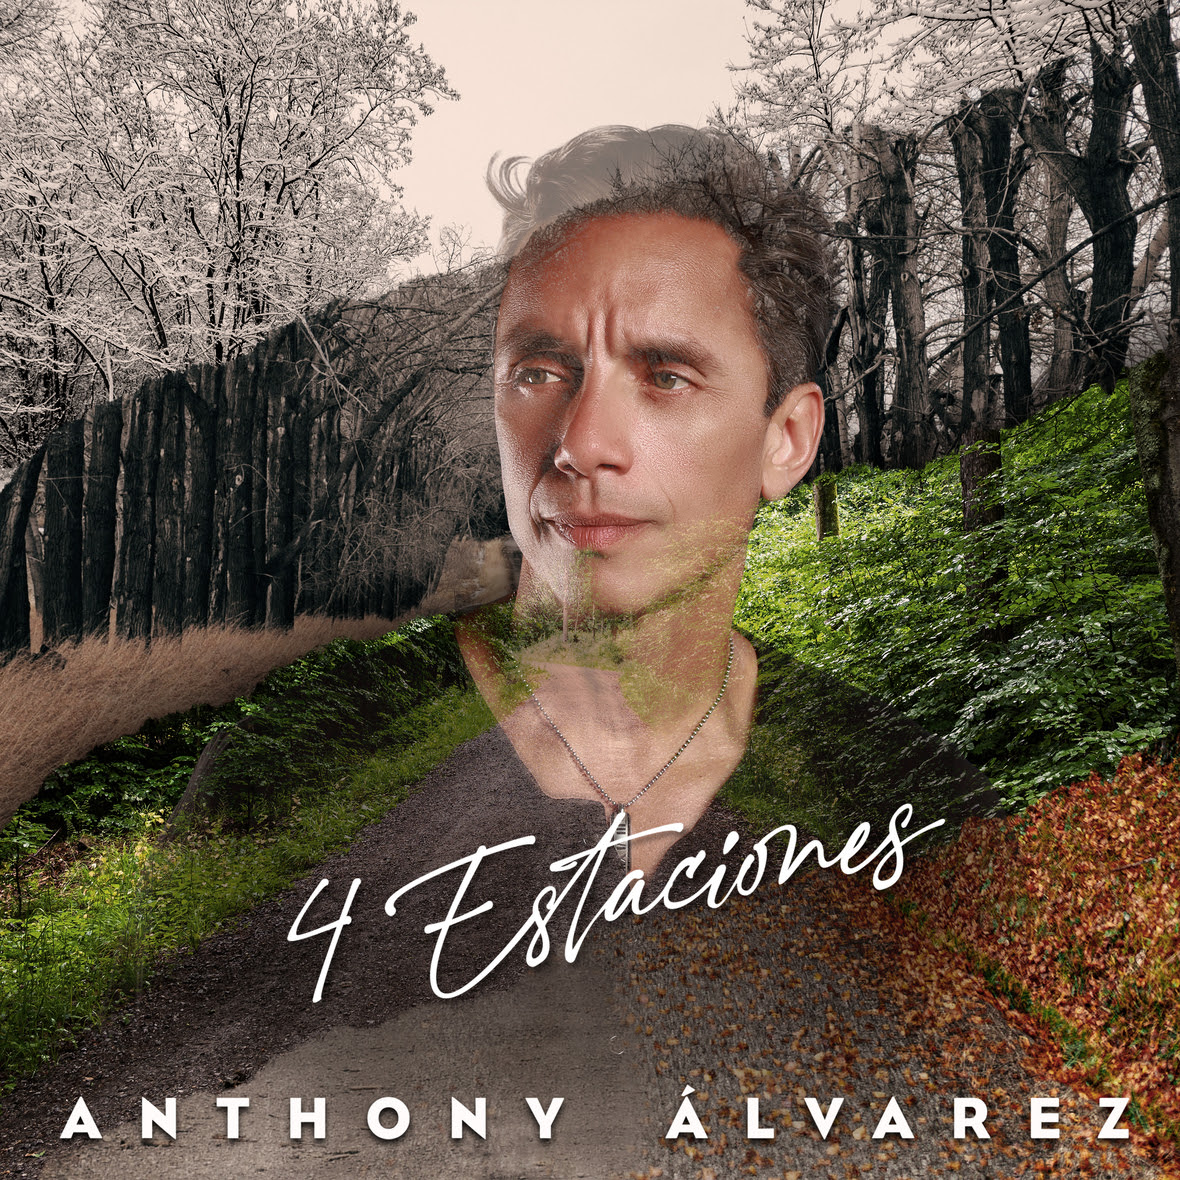 HD COVER  ANTHONY ALVAREZ 4 ESTACIONES